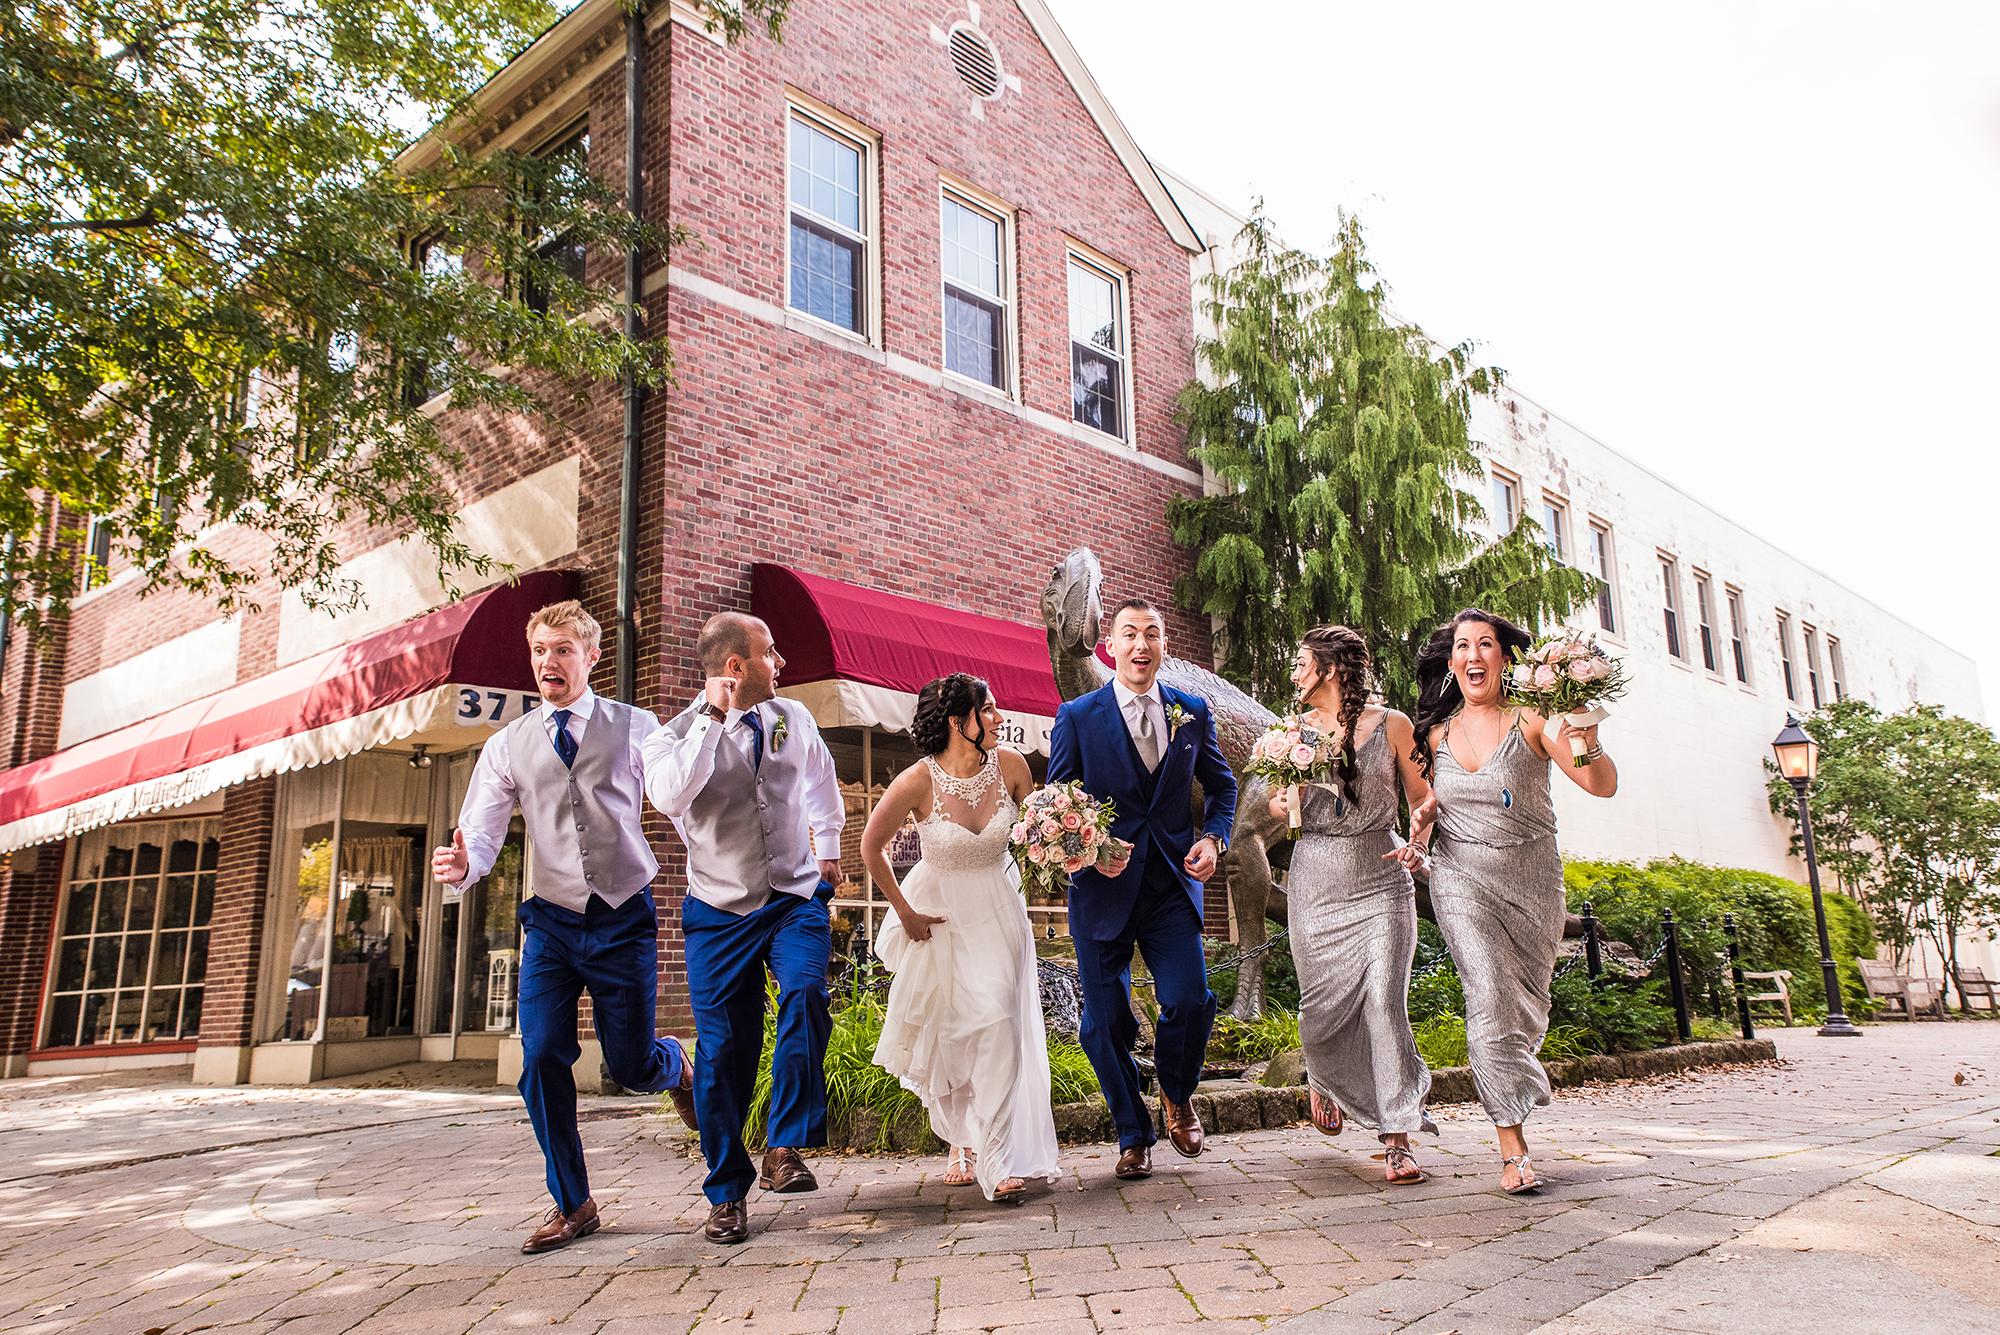 trenos-wedding-lbi-photographer-12.jpg